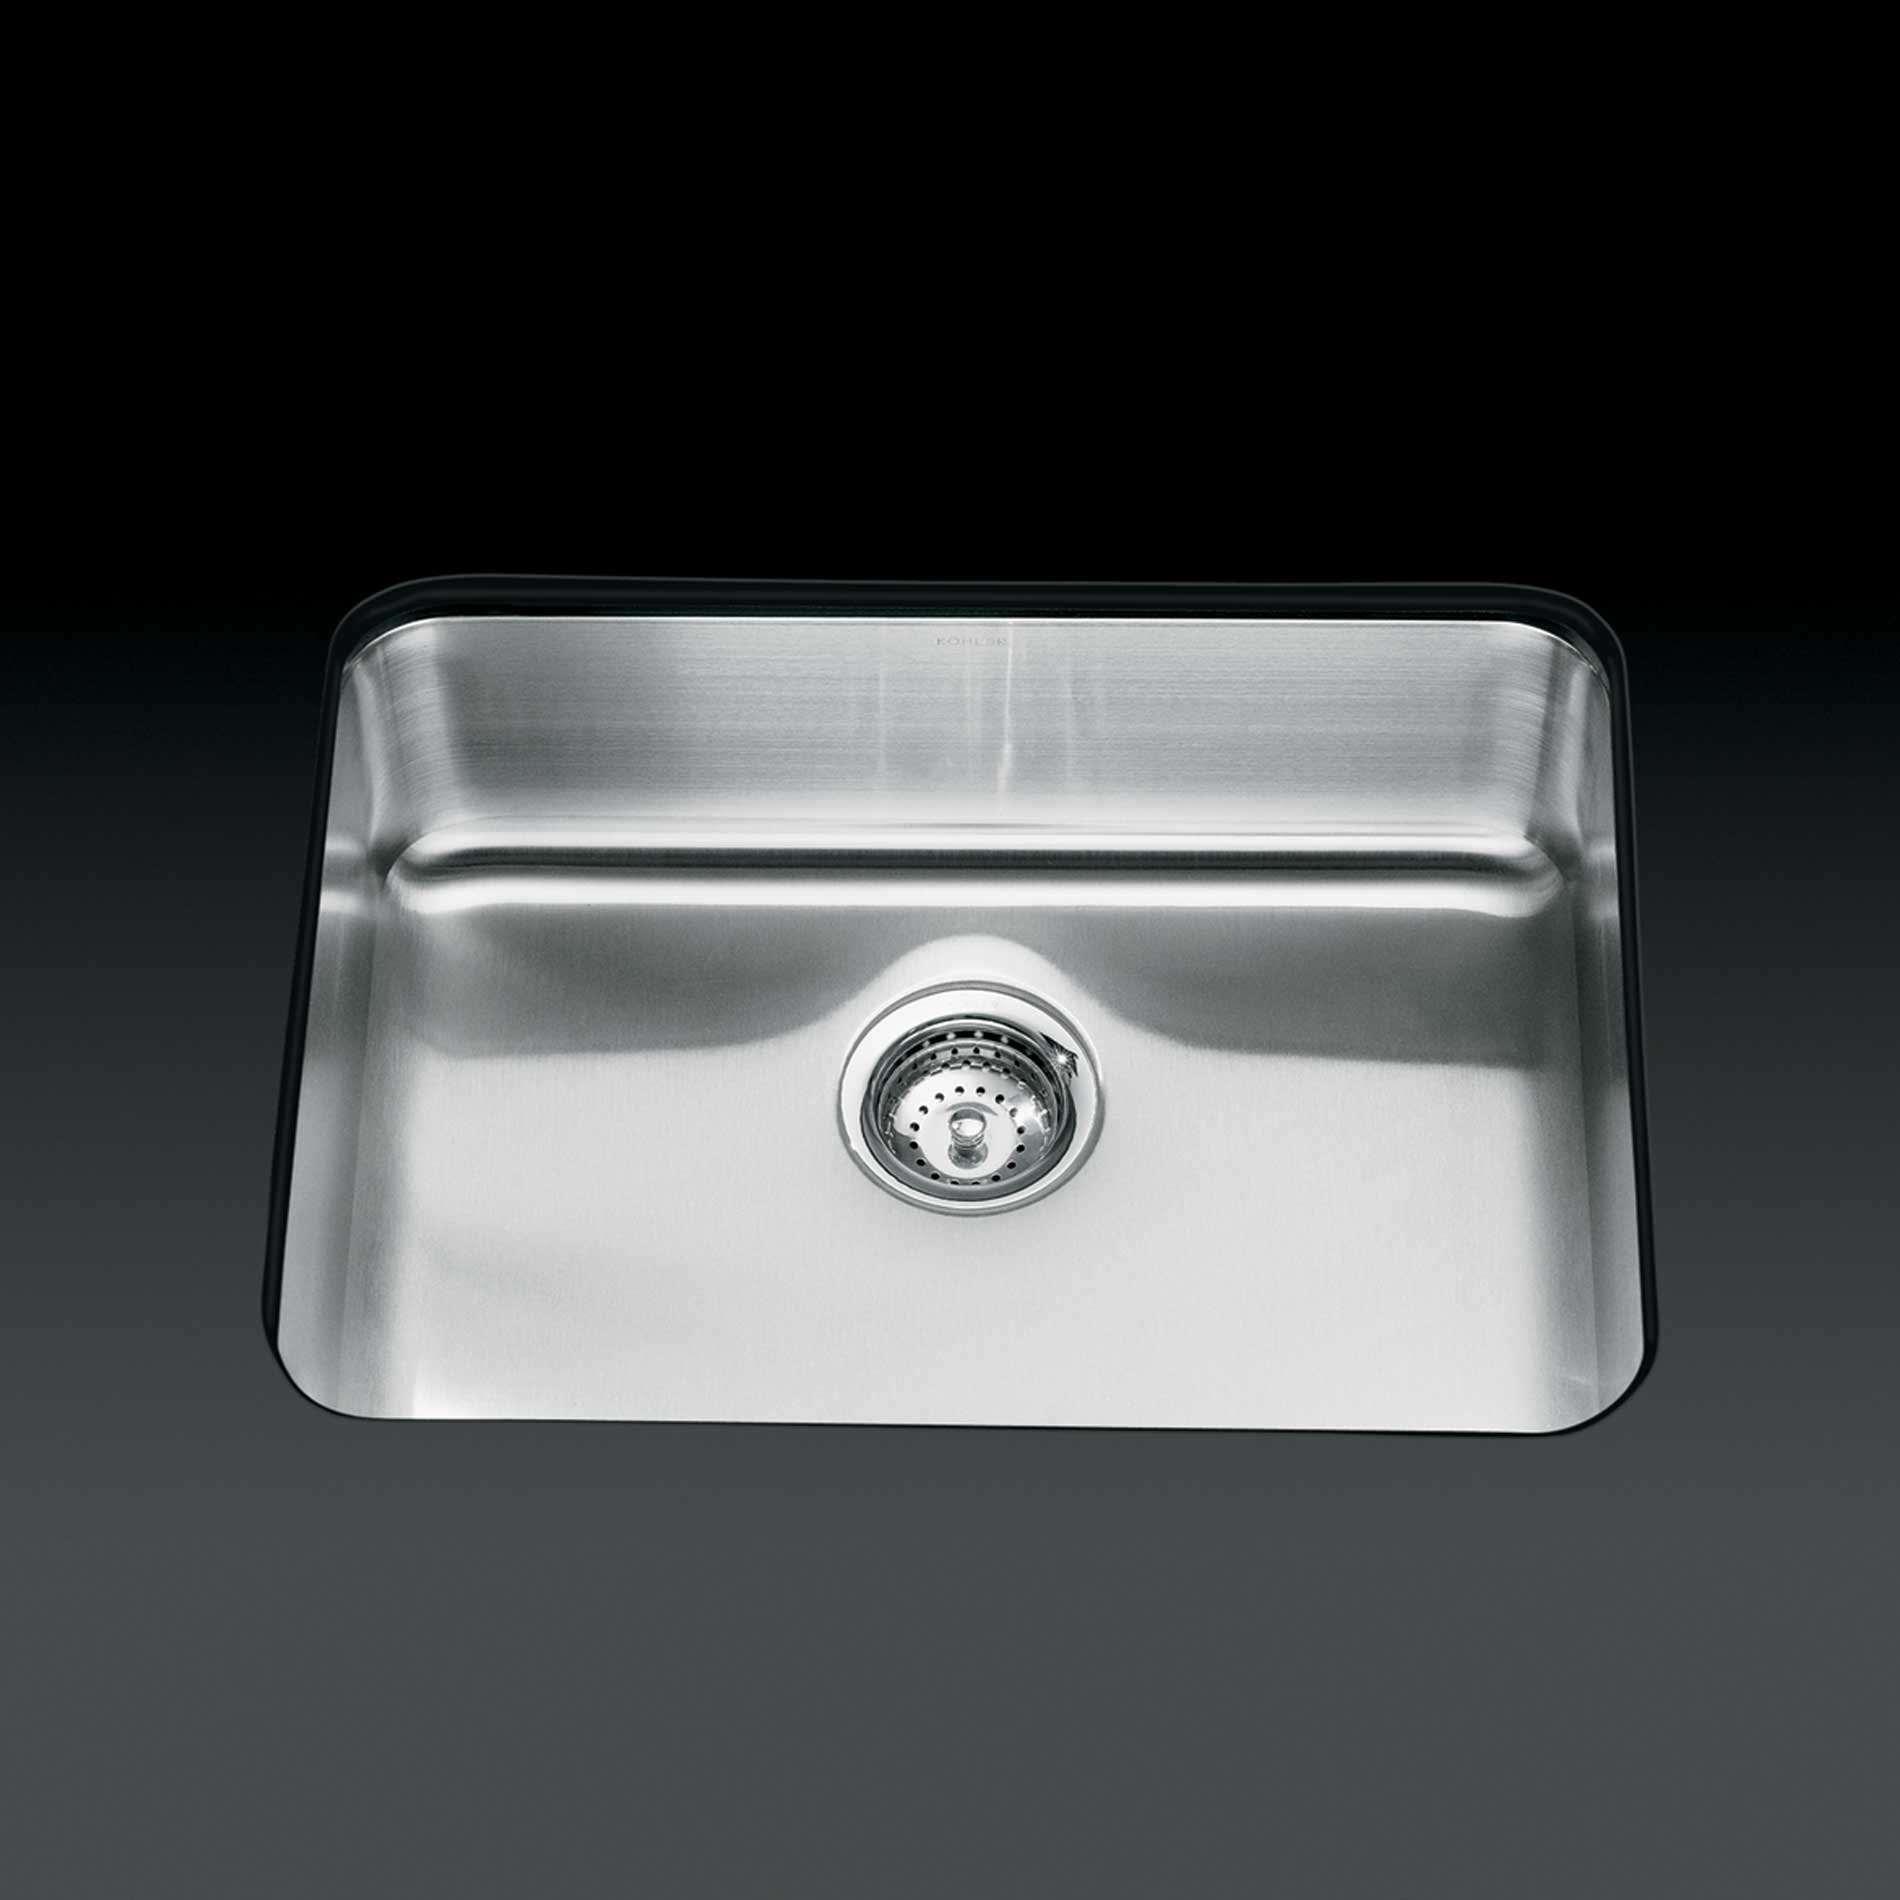 Kohler Sinks Kitchen Sinks & Taps